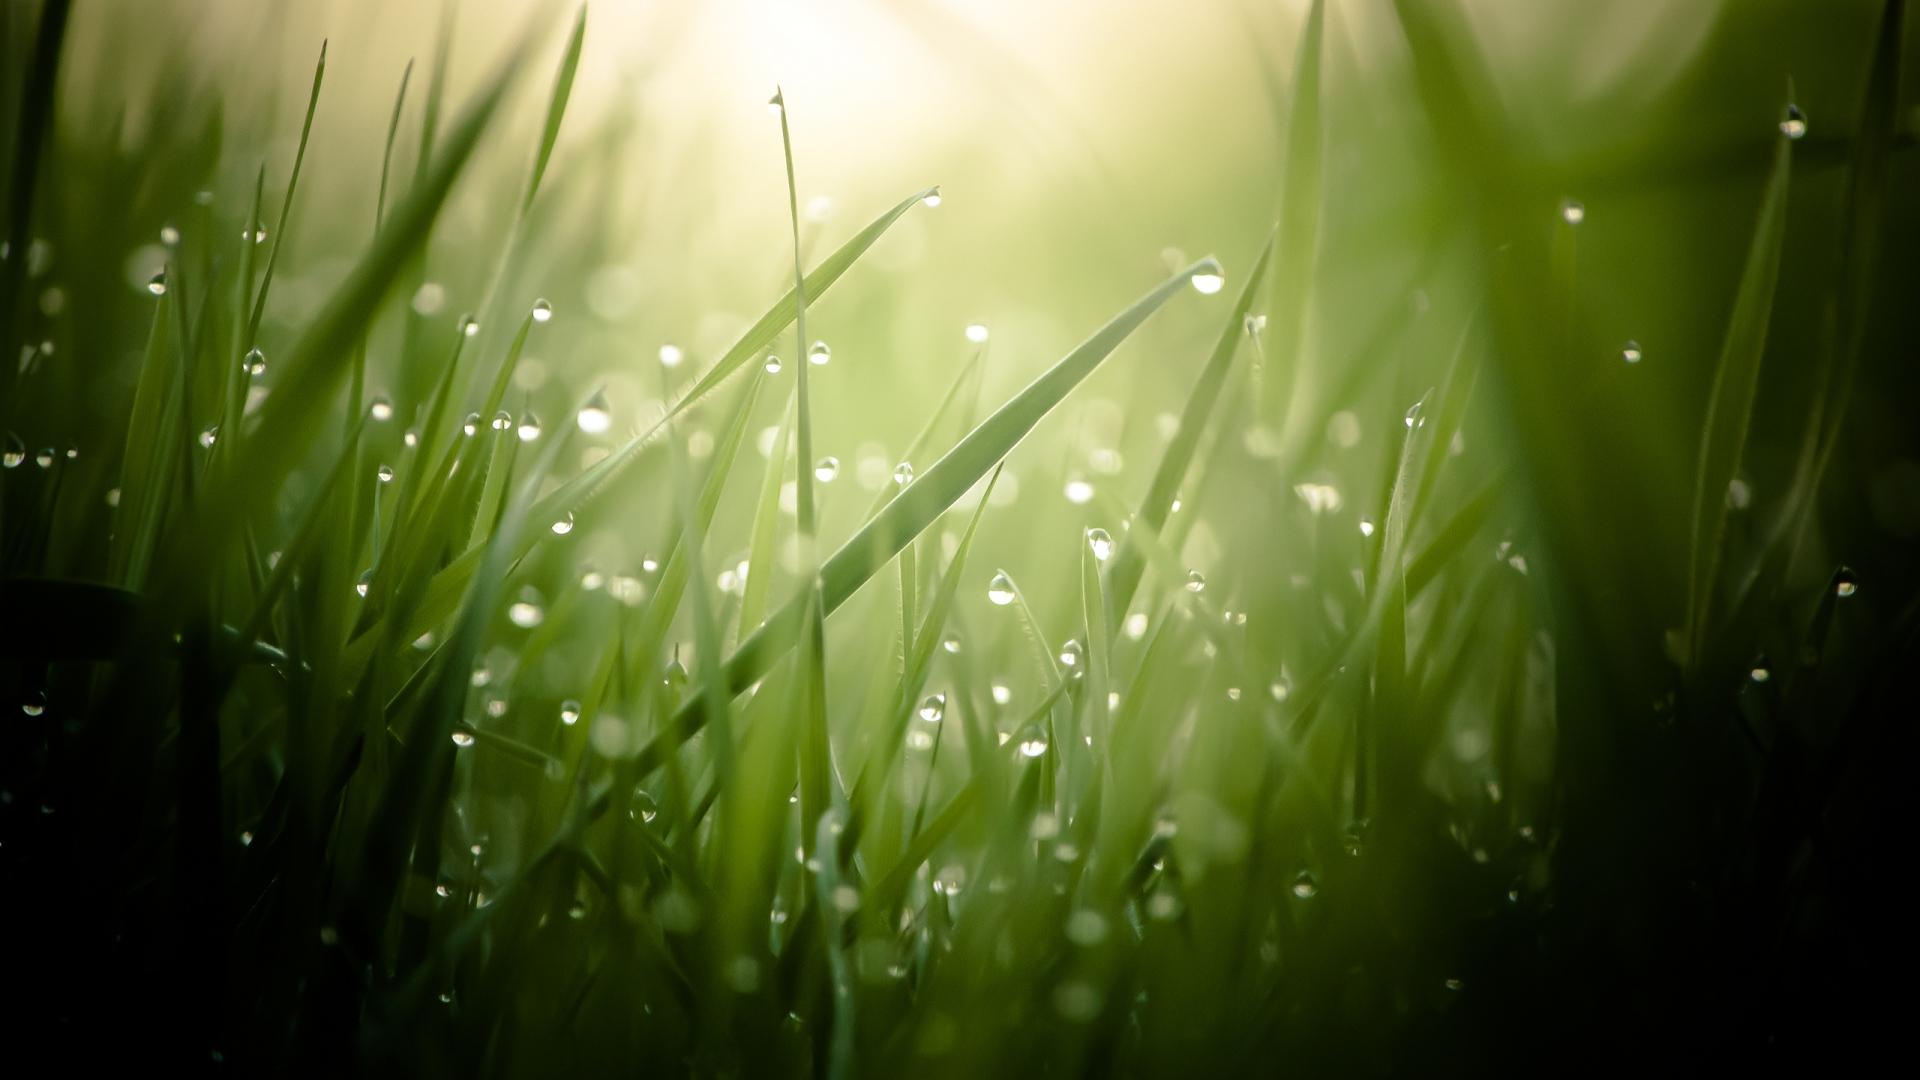 water drops on grass wallpaper